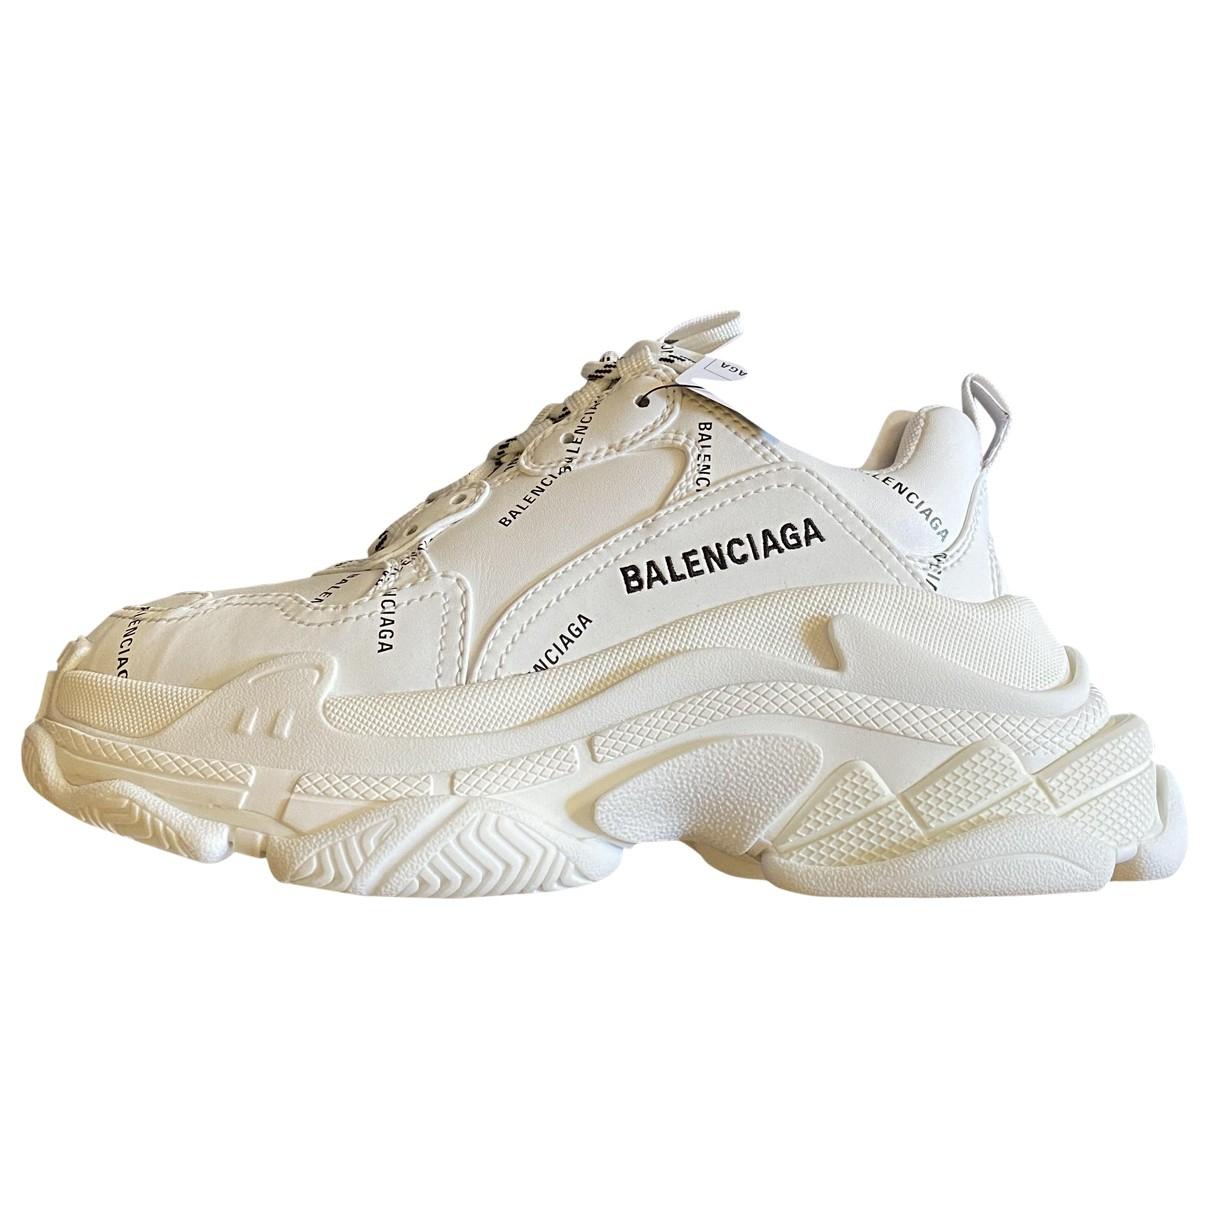 Balenciaga - Baskets Triple S pour femme en cuir - blanc